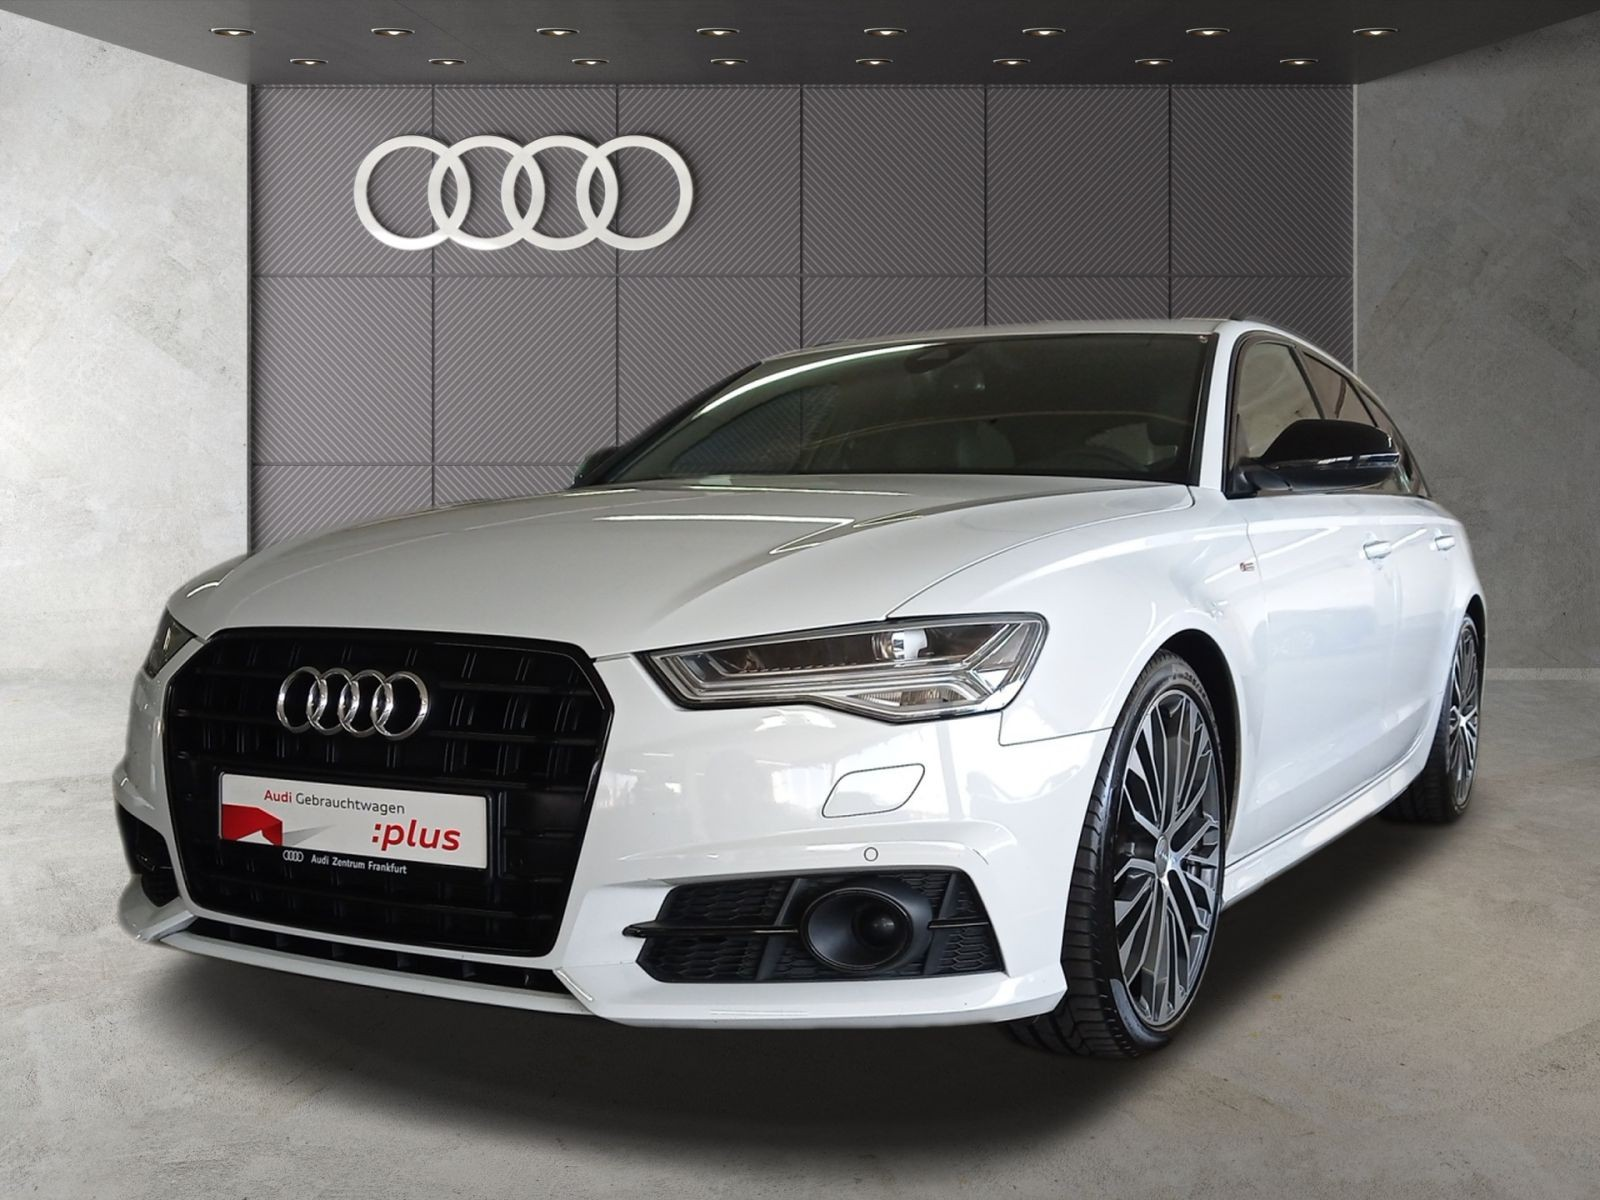 Audi A6 Avant 2.0 TDI S tronic S line Black Edition Navi Matrix-LED Panorama, Jahr 2018, Diesel